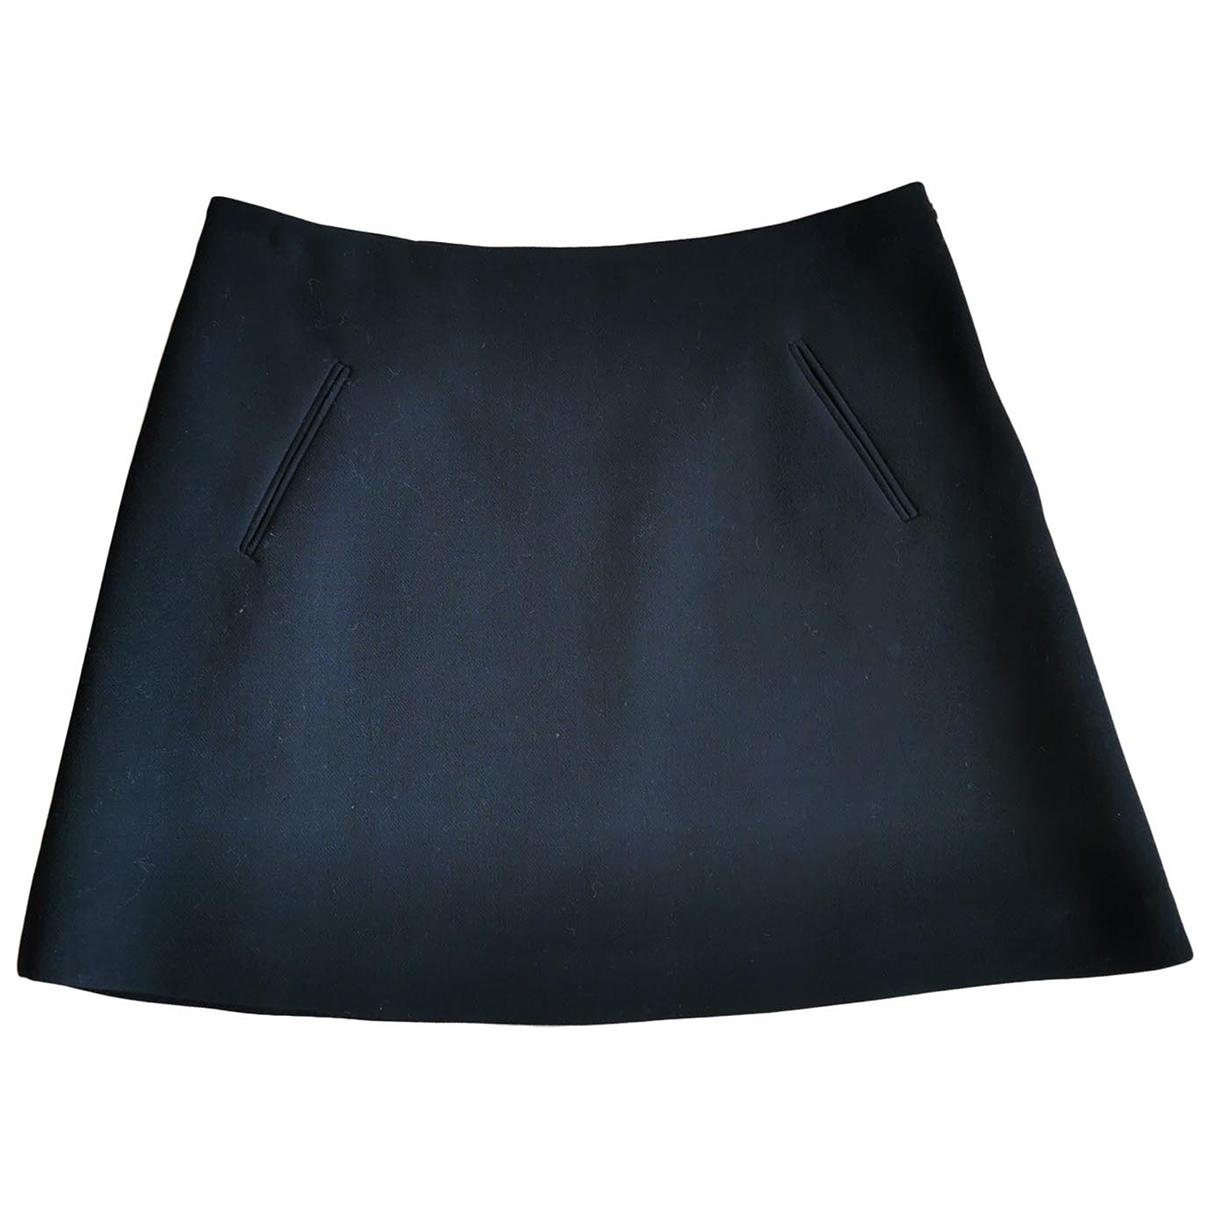 Marni \N Black Wool skirt for Women 44 IT